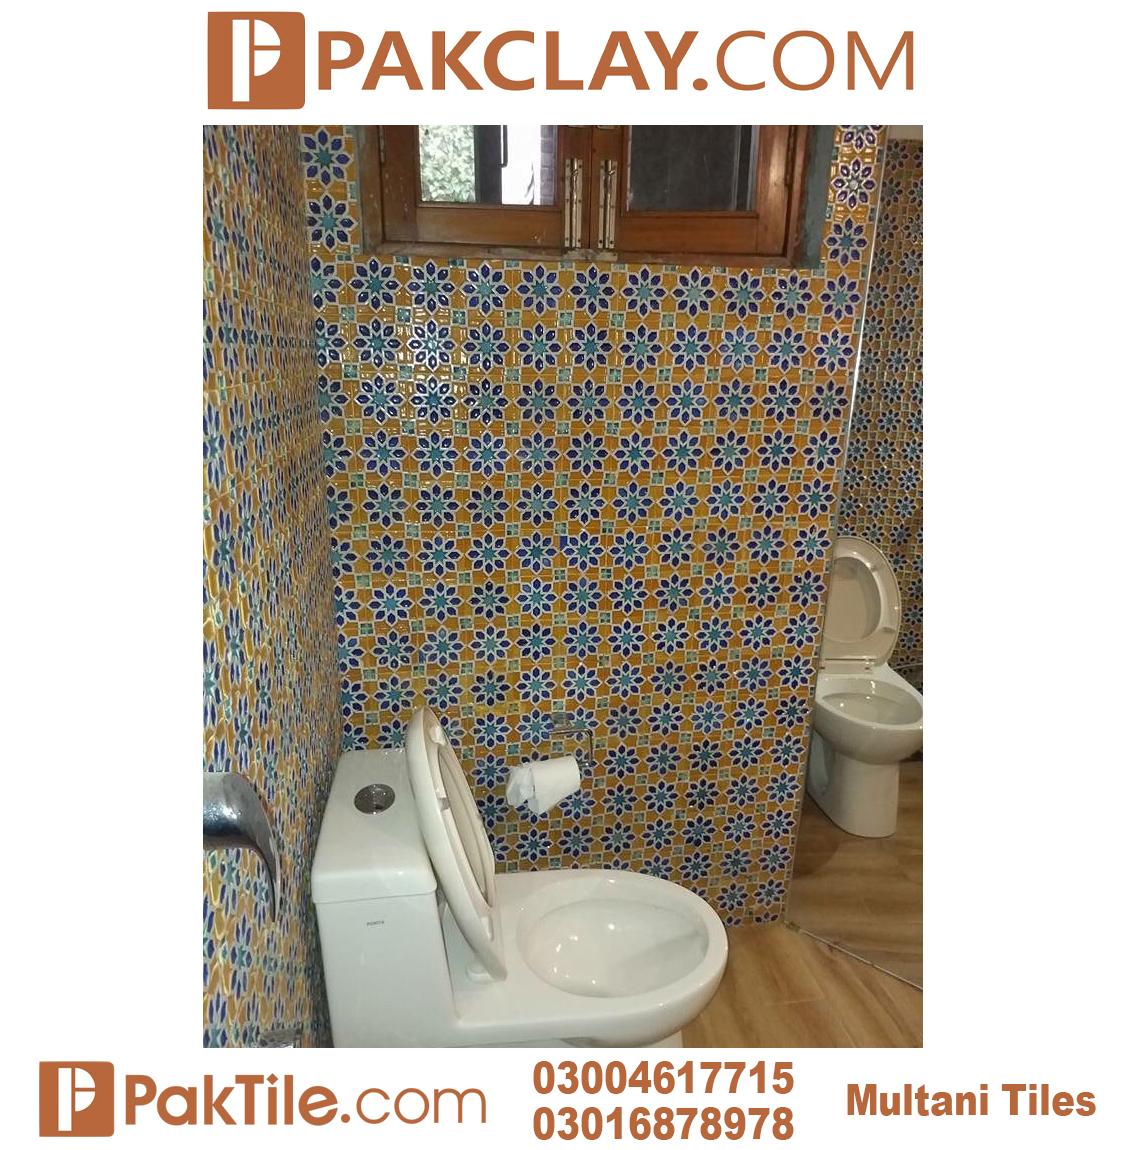 Toilet Blue Multani Tiles For Washroom